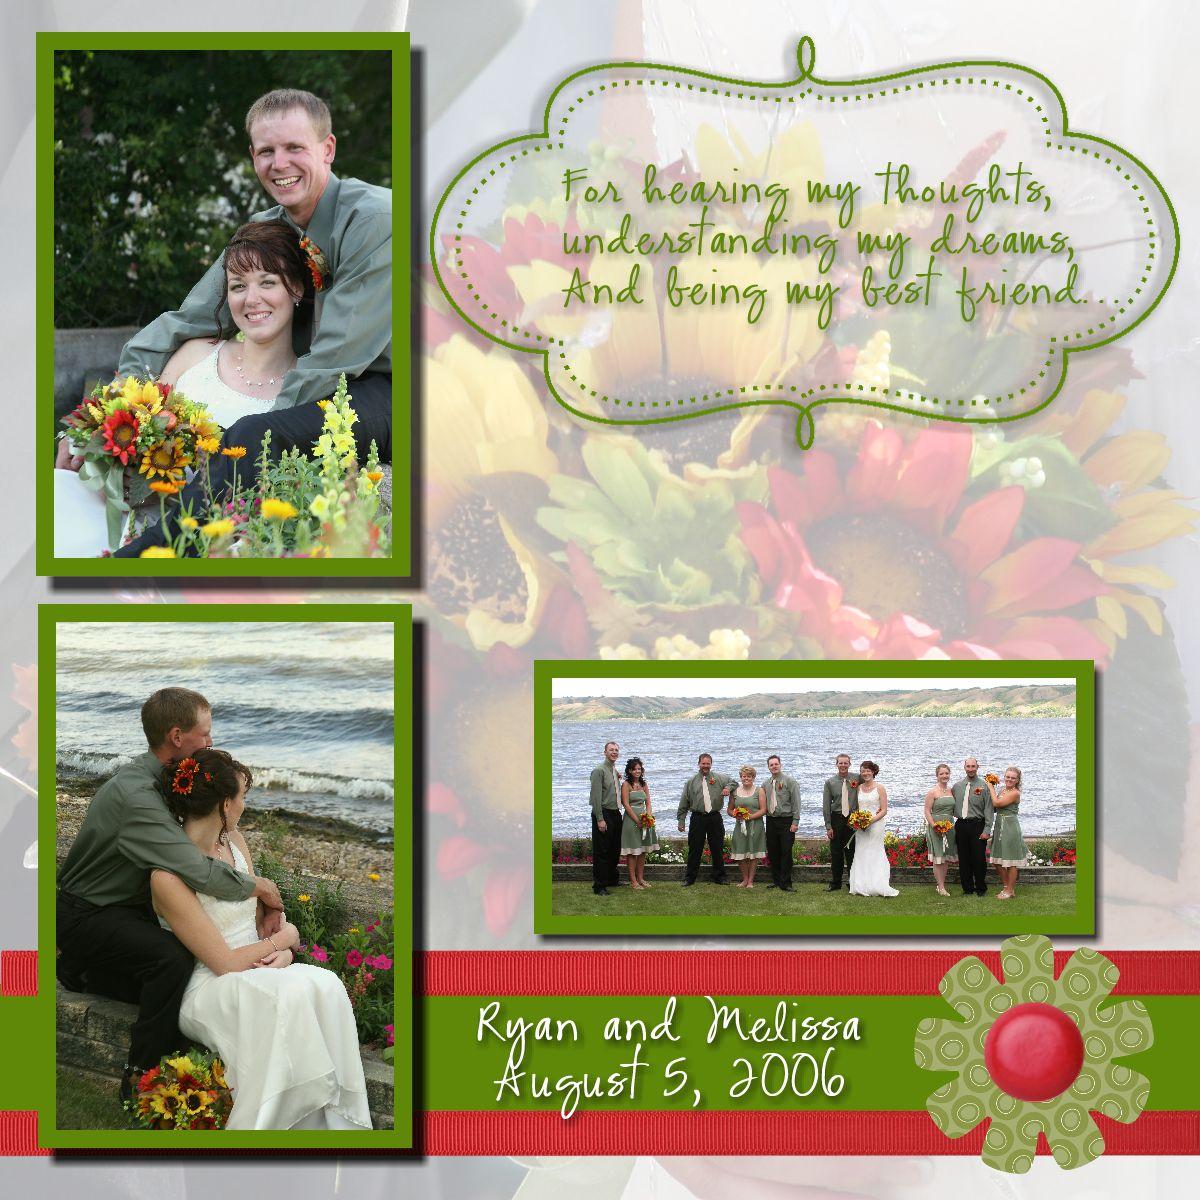 Wedding scrapbook ideas layouts - Porch Swing Creations My Digital Studio Wedding Scrapbook 1200x1200